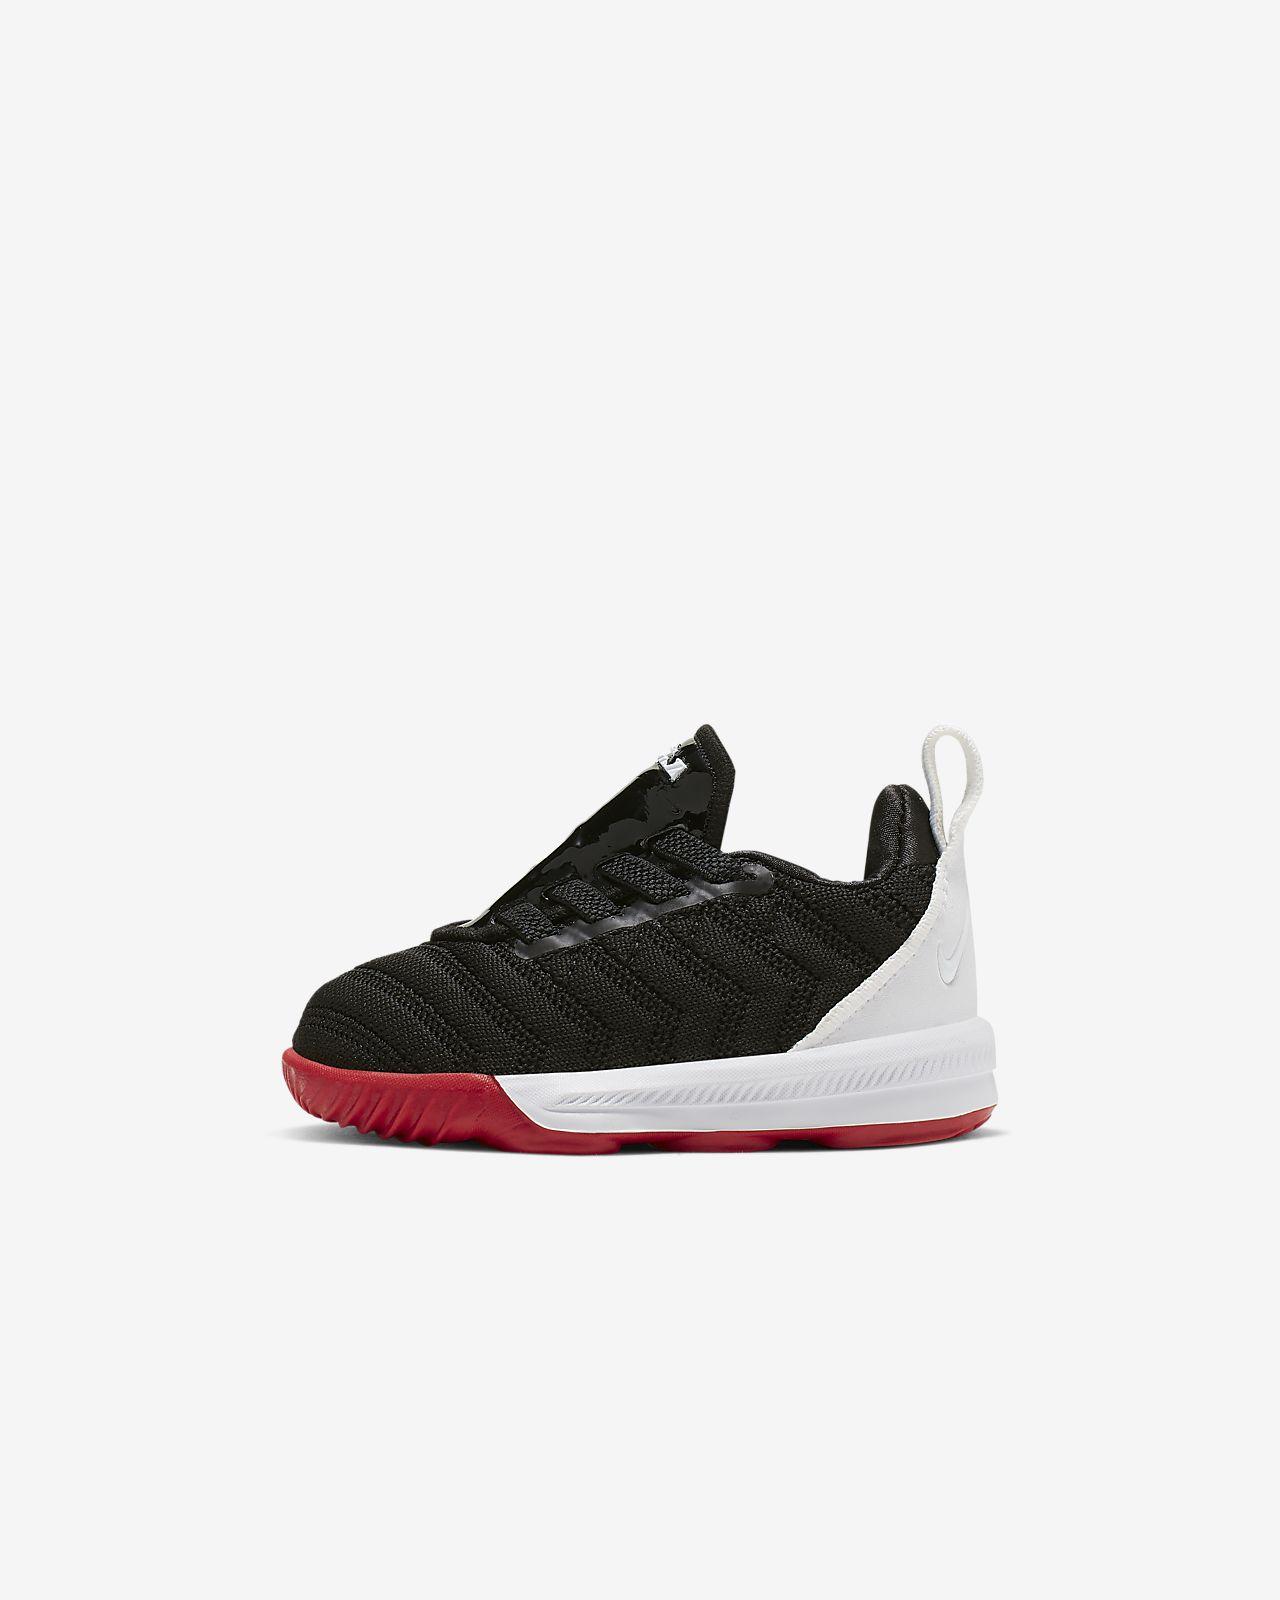 LeBron XVI Infant/Toddler Shoe